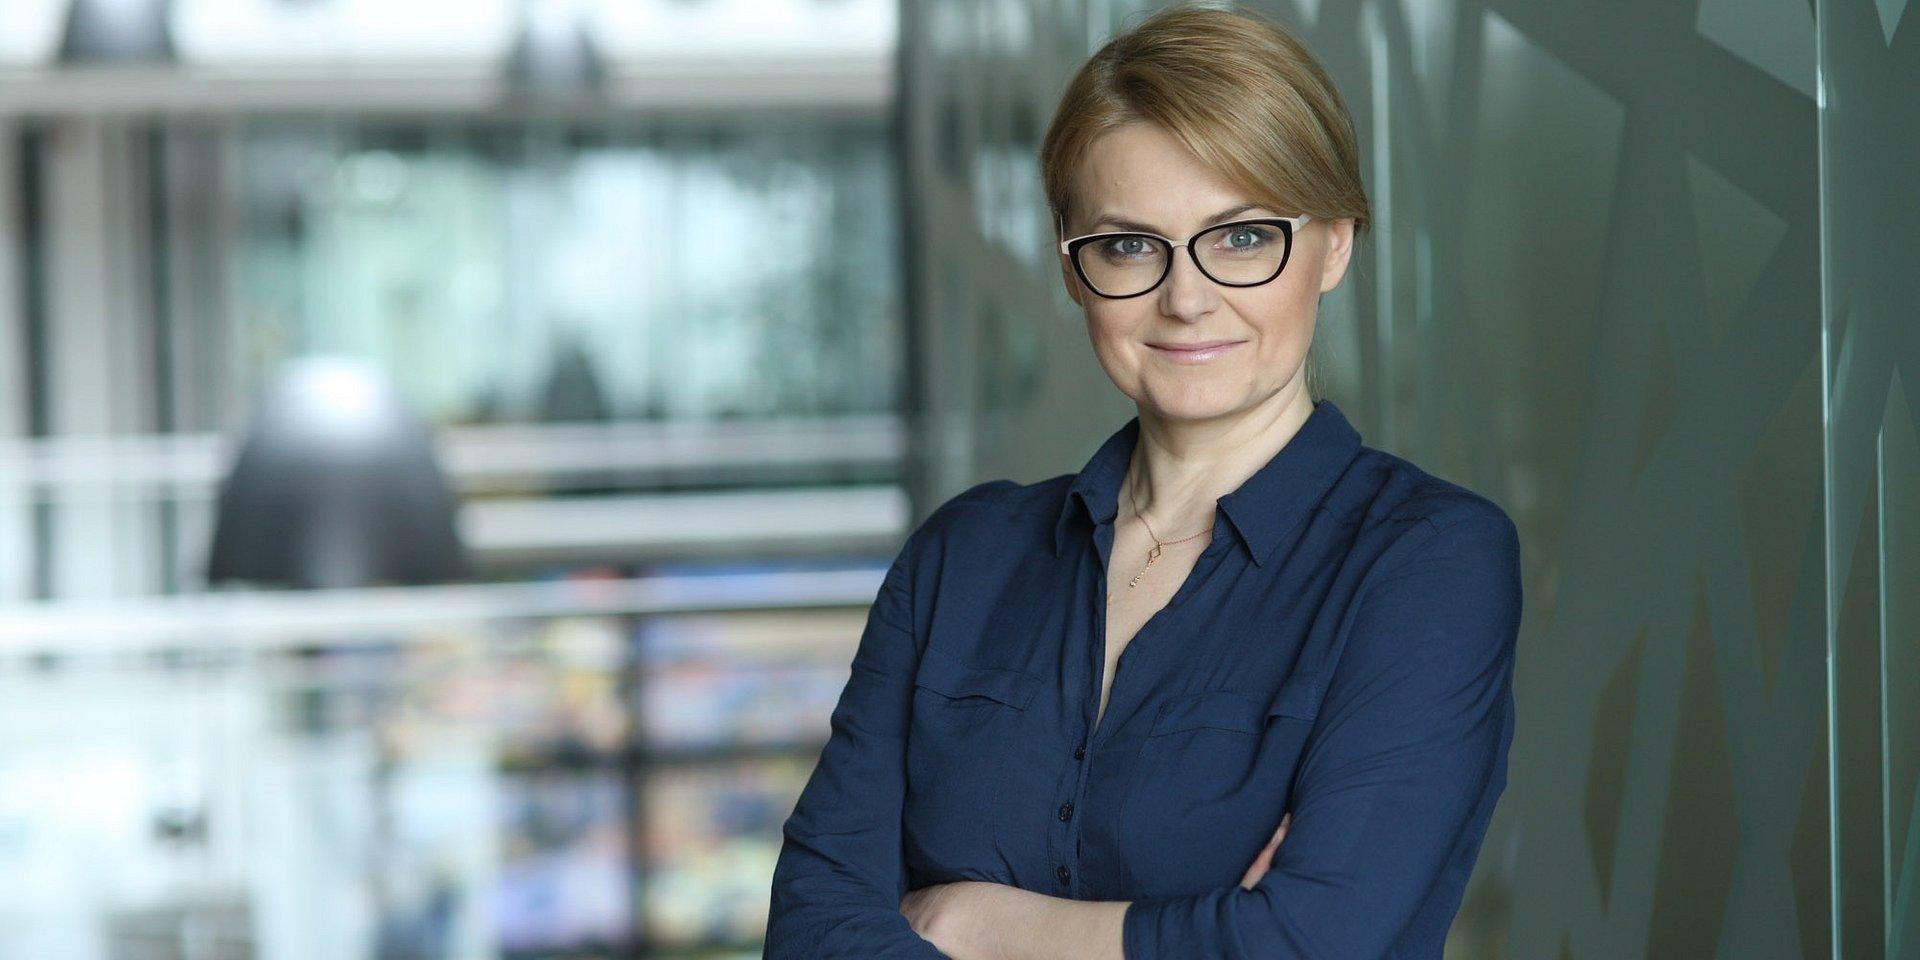 Agnieszka Gotlibowska-Horoszczak becomes Billon's Chairwoman; Anand Phanse takes over as Billon's CFO